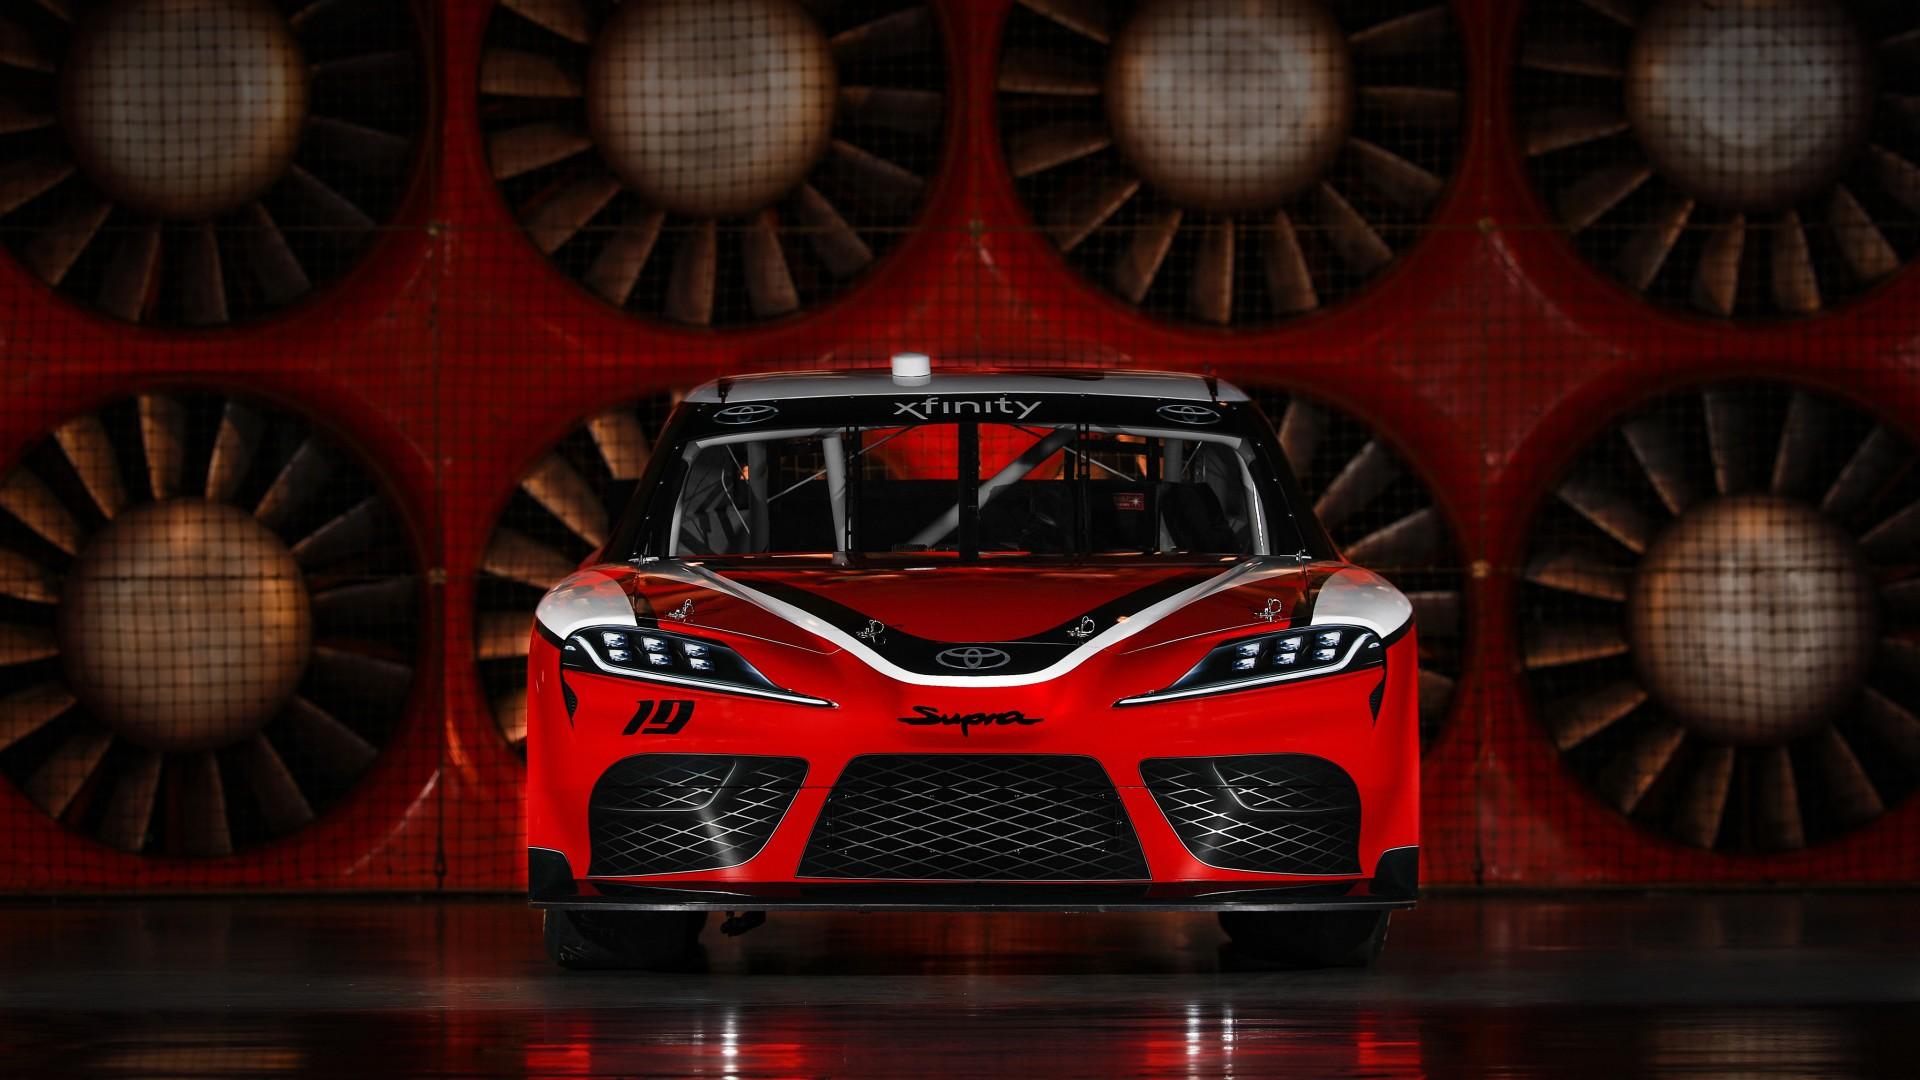 Toyota Xfinity Supra 2019 4K Wallpaper   HD Car Wallpapers ...